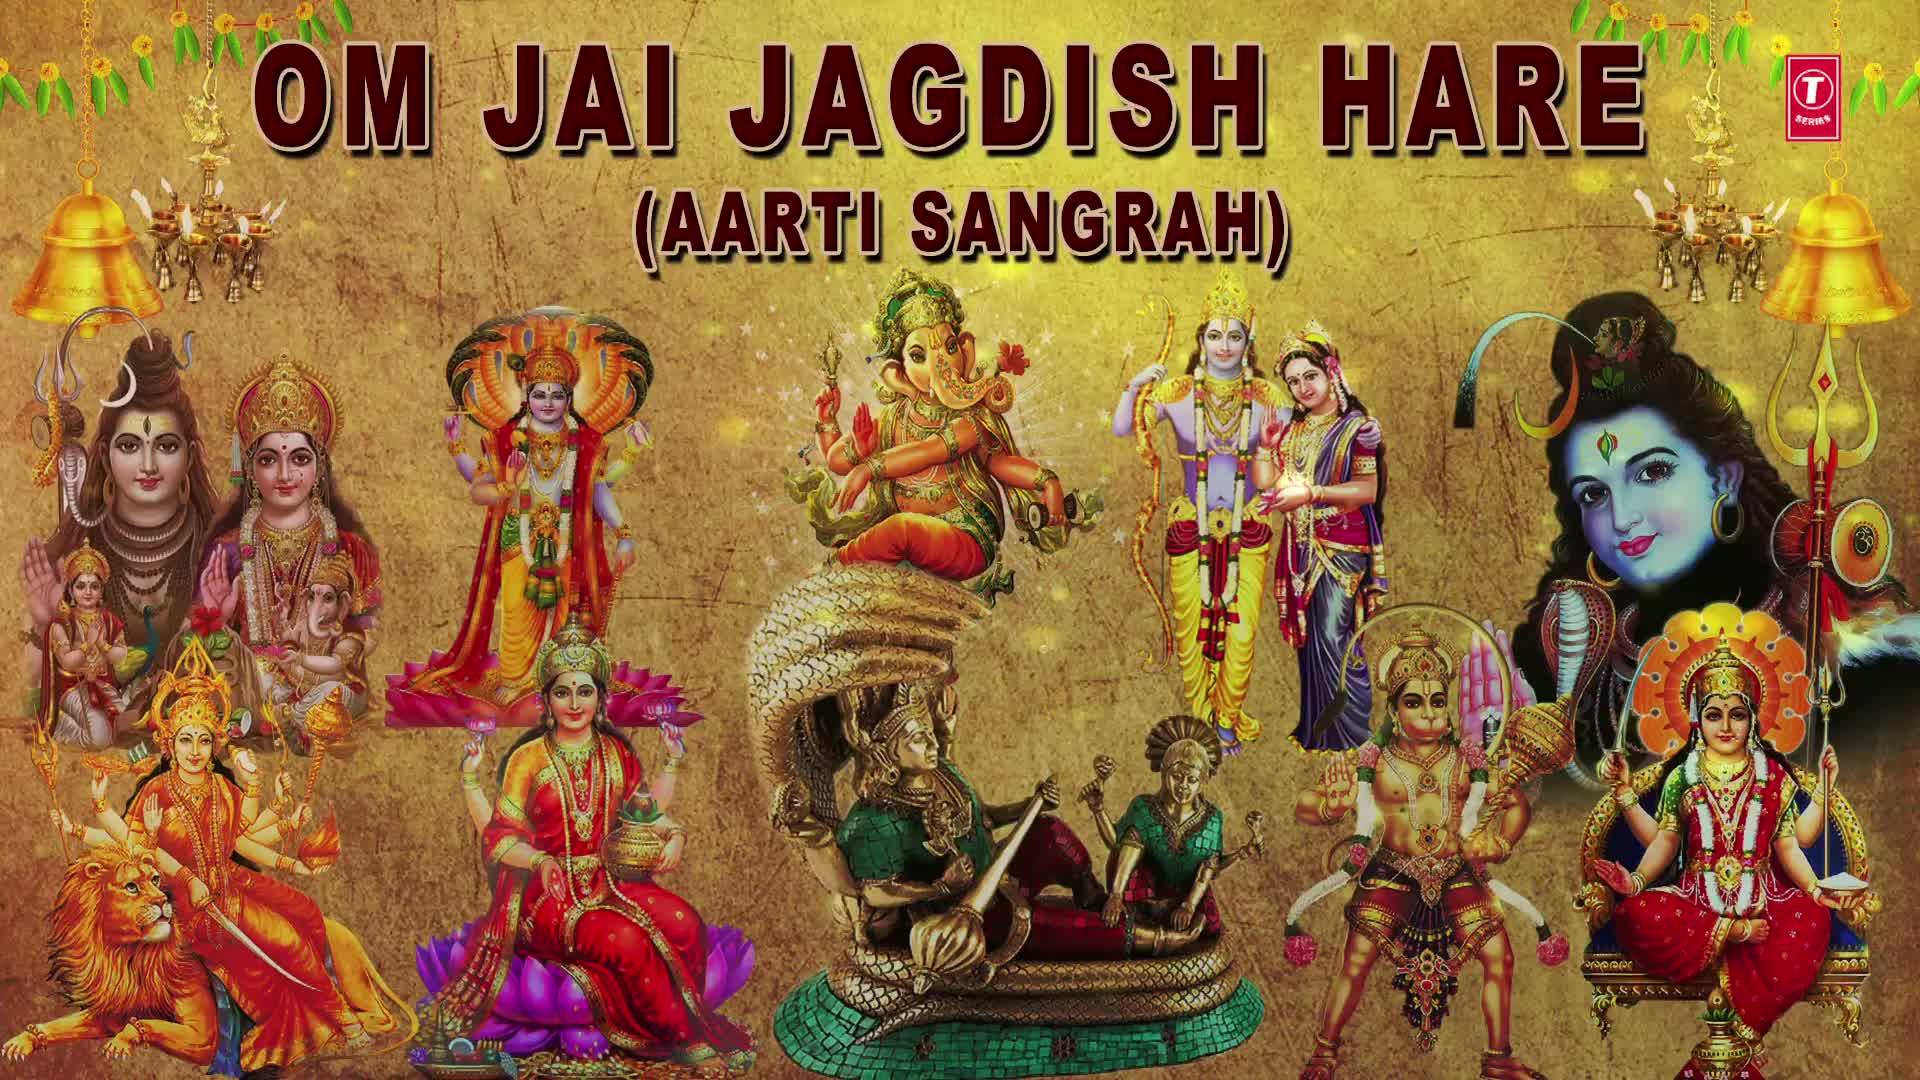 Om Jai Jagdish Hare Aarti Sangrah Best Aarti Collection By Anuradha Paudwal  I Audio Juke Box